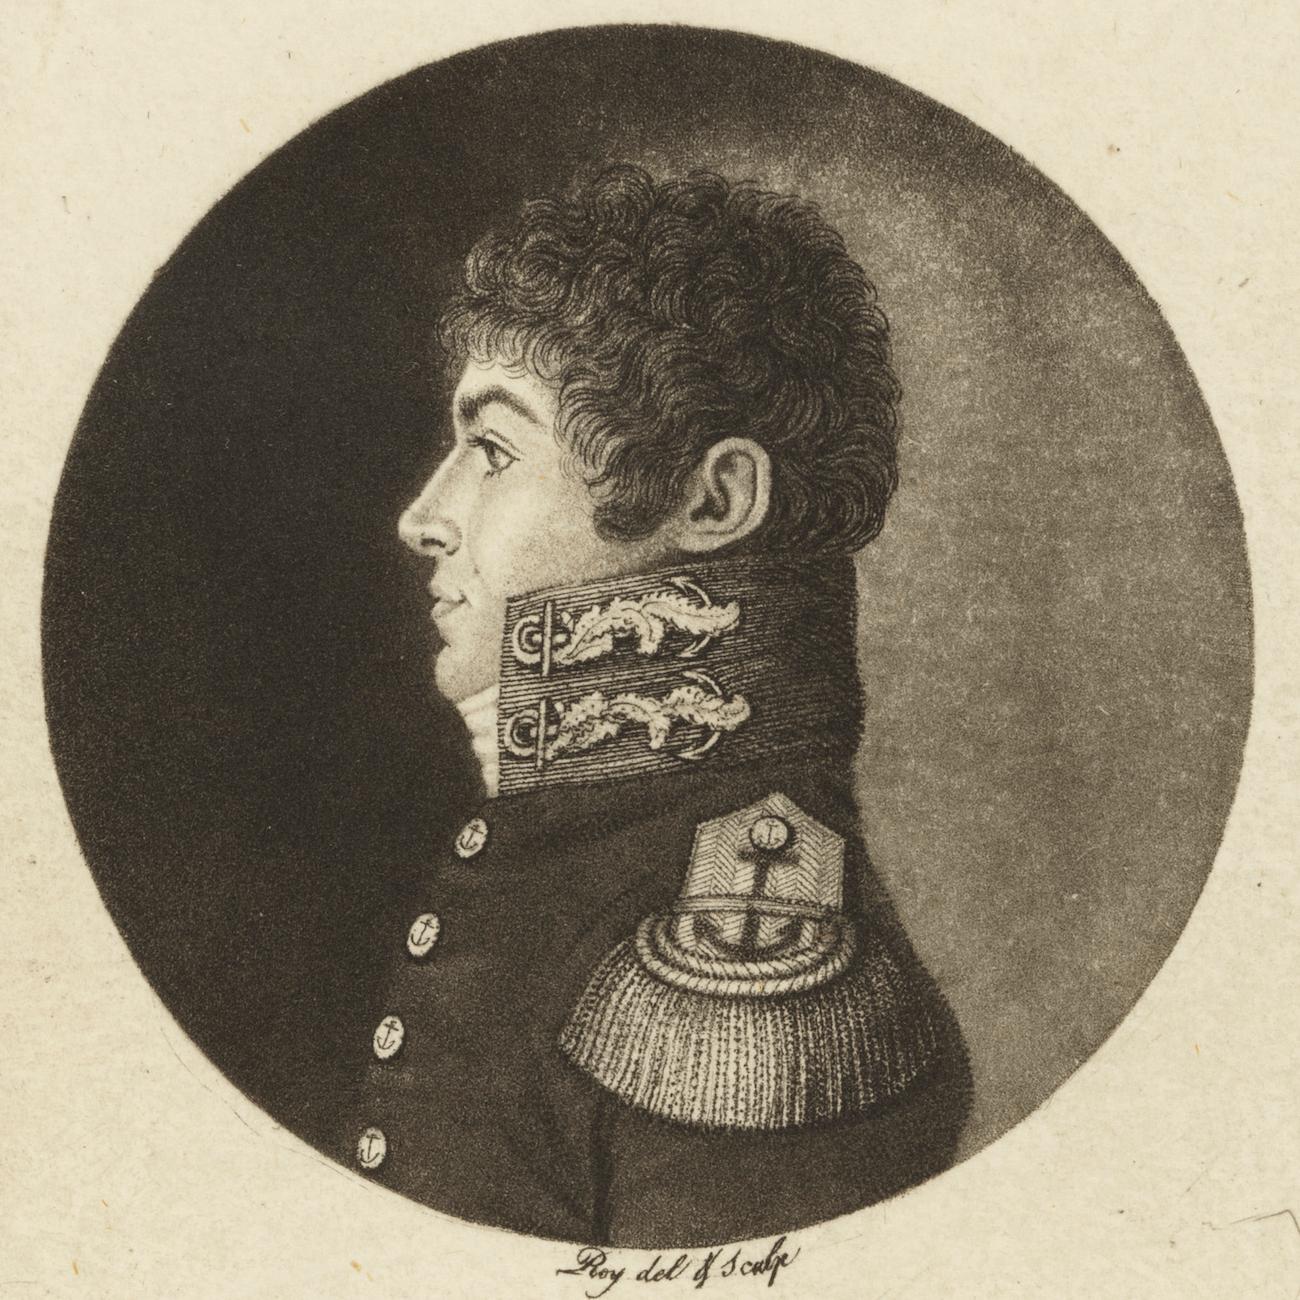 Louis de Freycinet, French officer